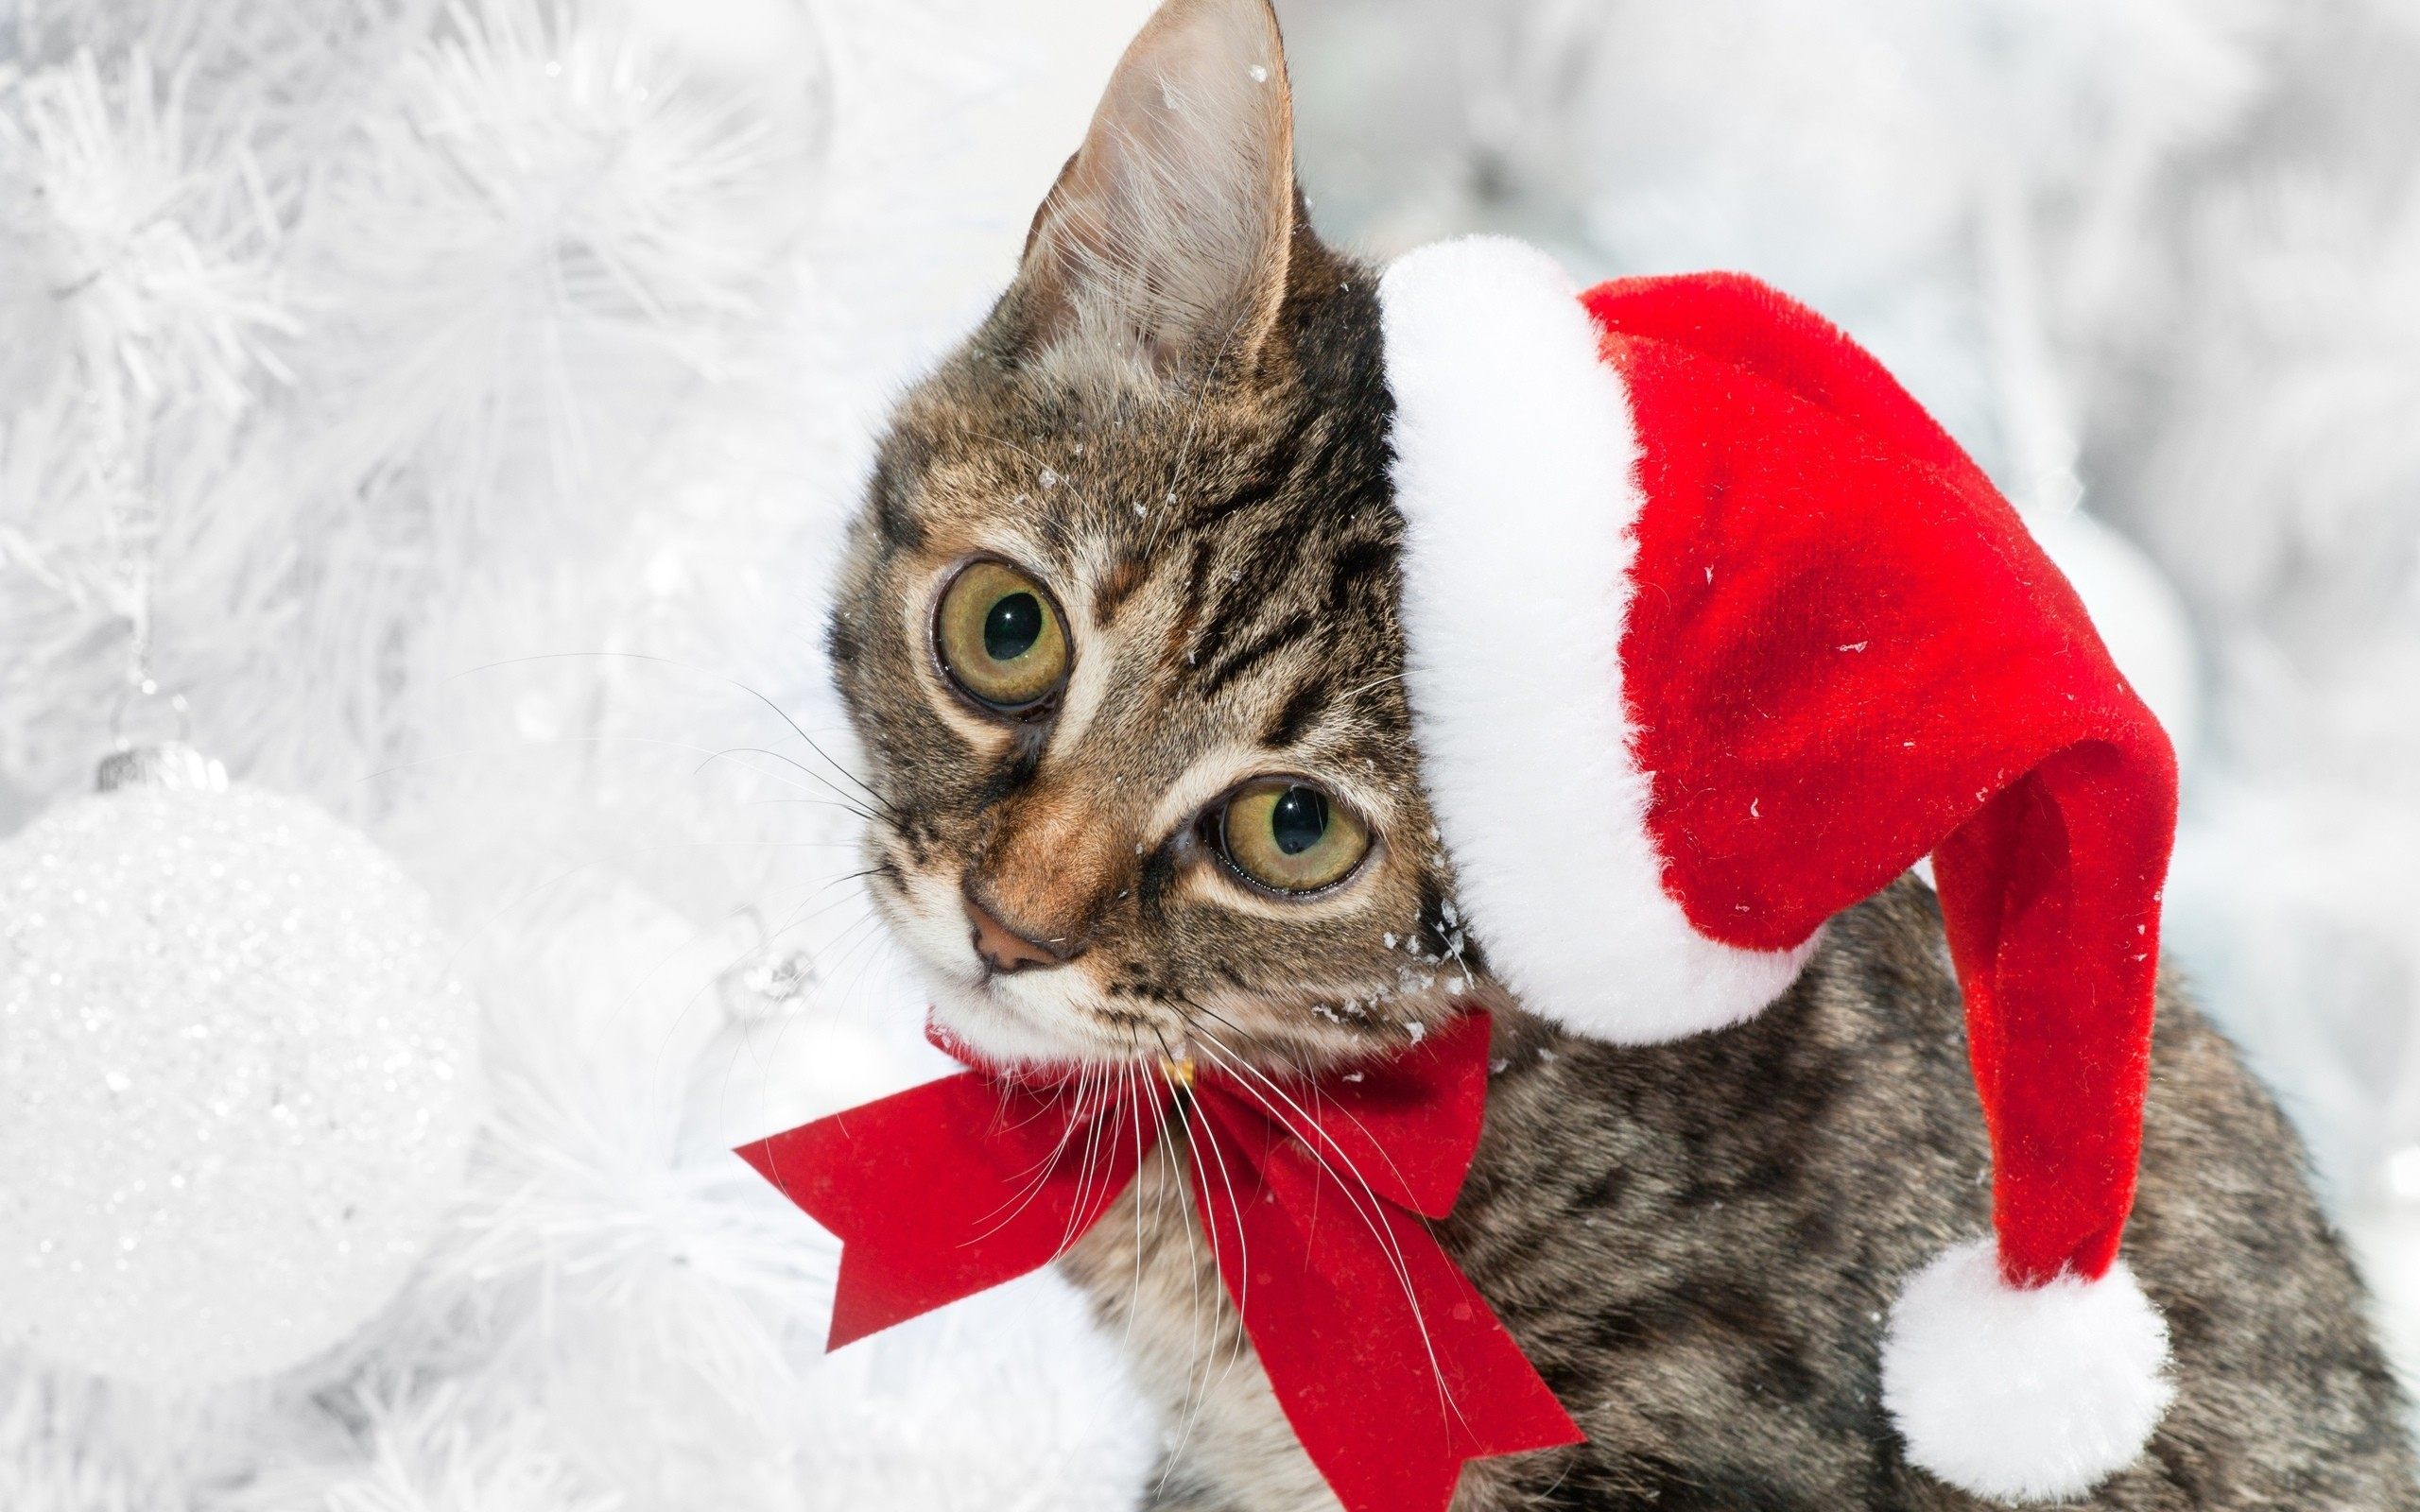 The Christmas Kitty wallpaper